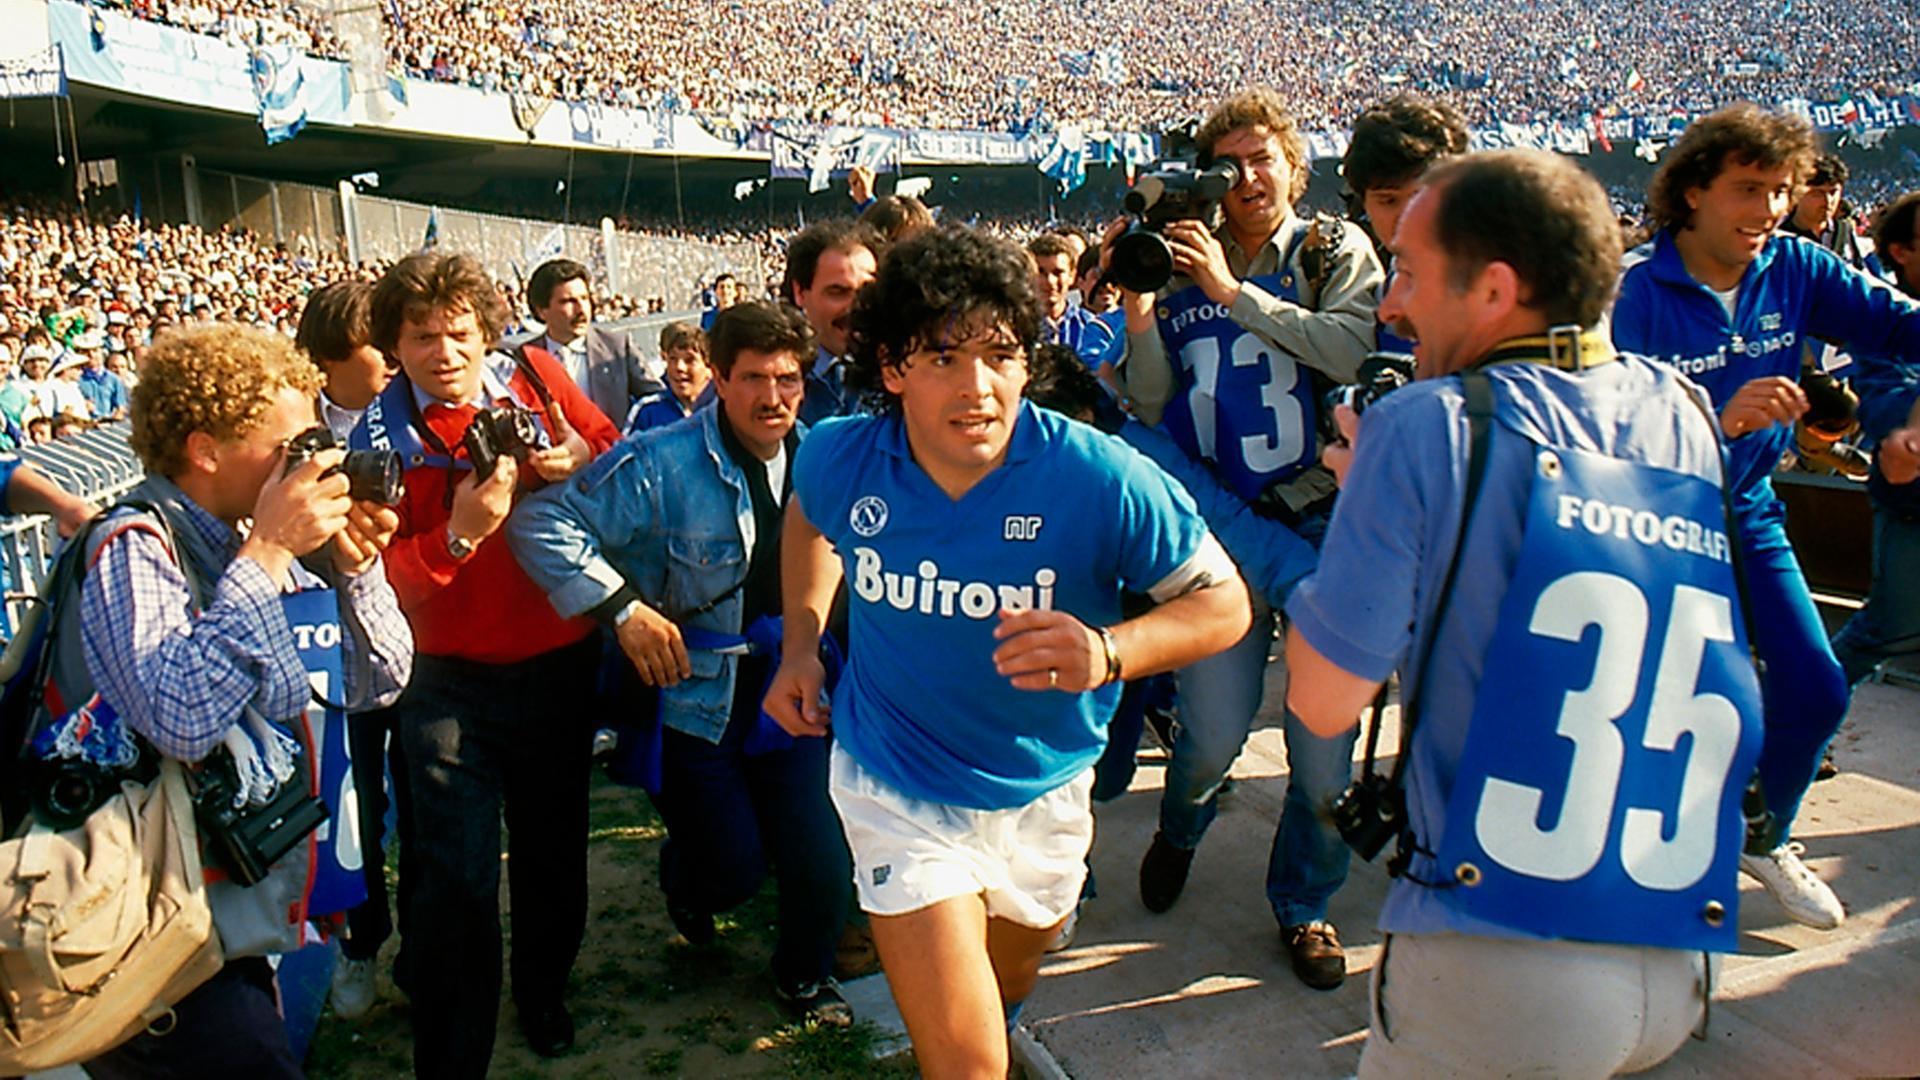 Diego Maradona – Die Filmografie kommt Anfang September in die deutschen Kinos